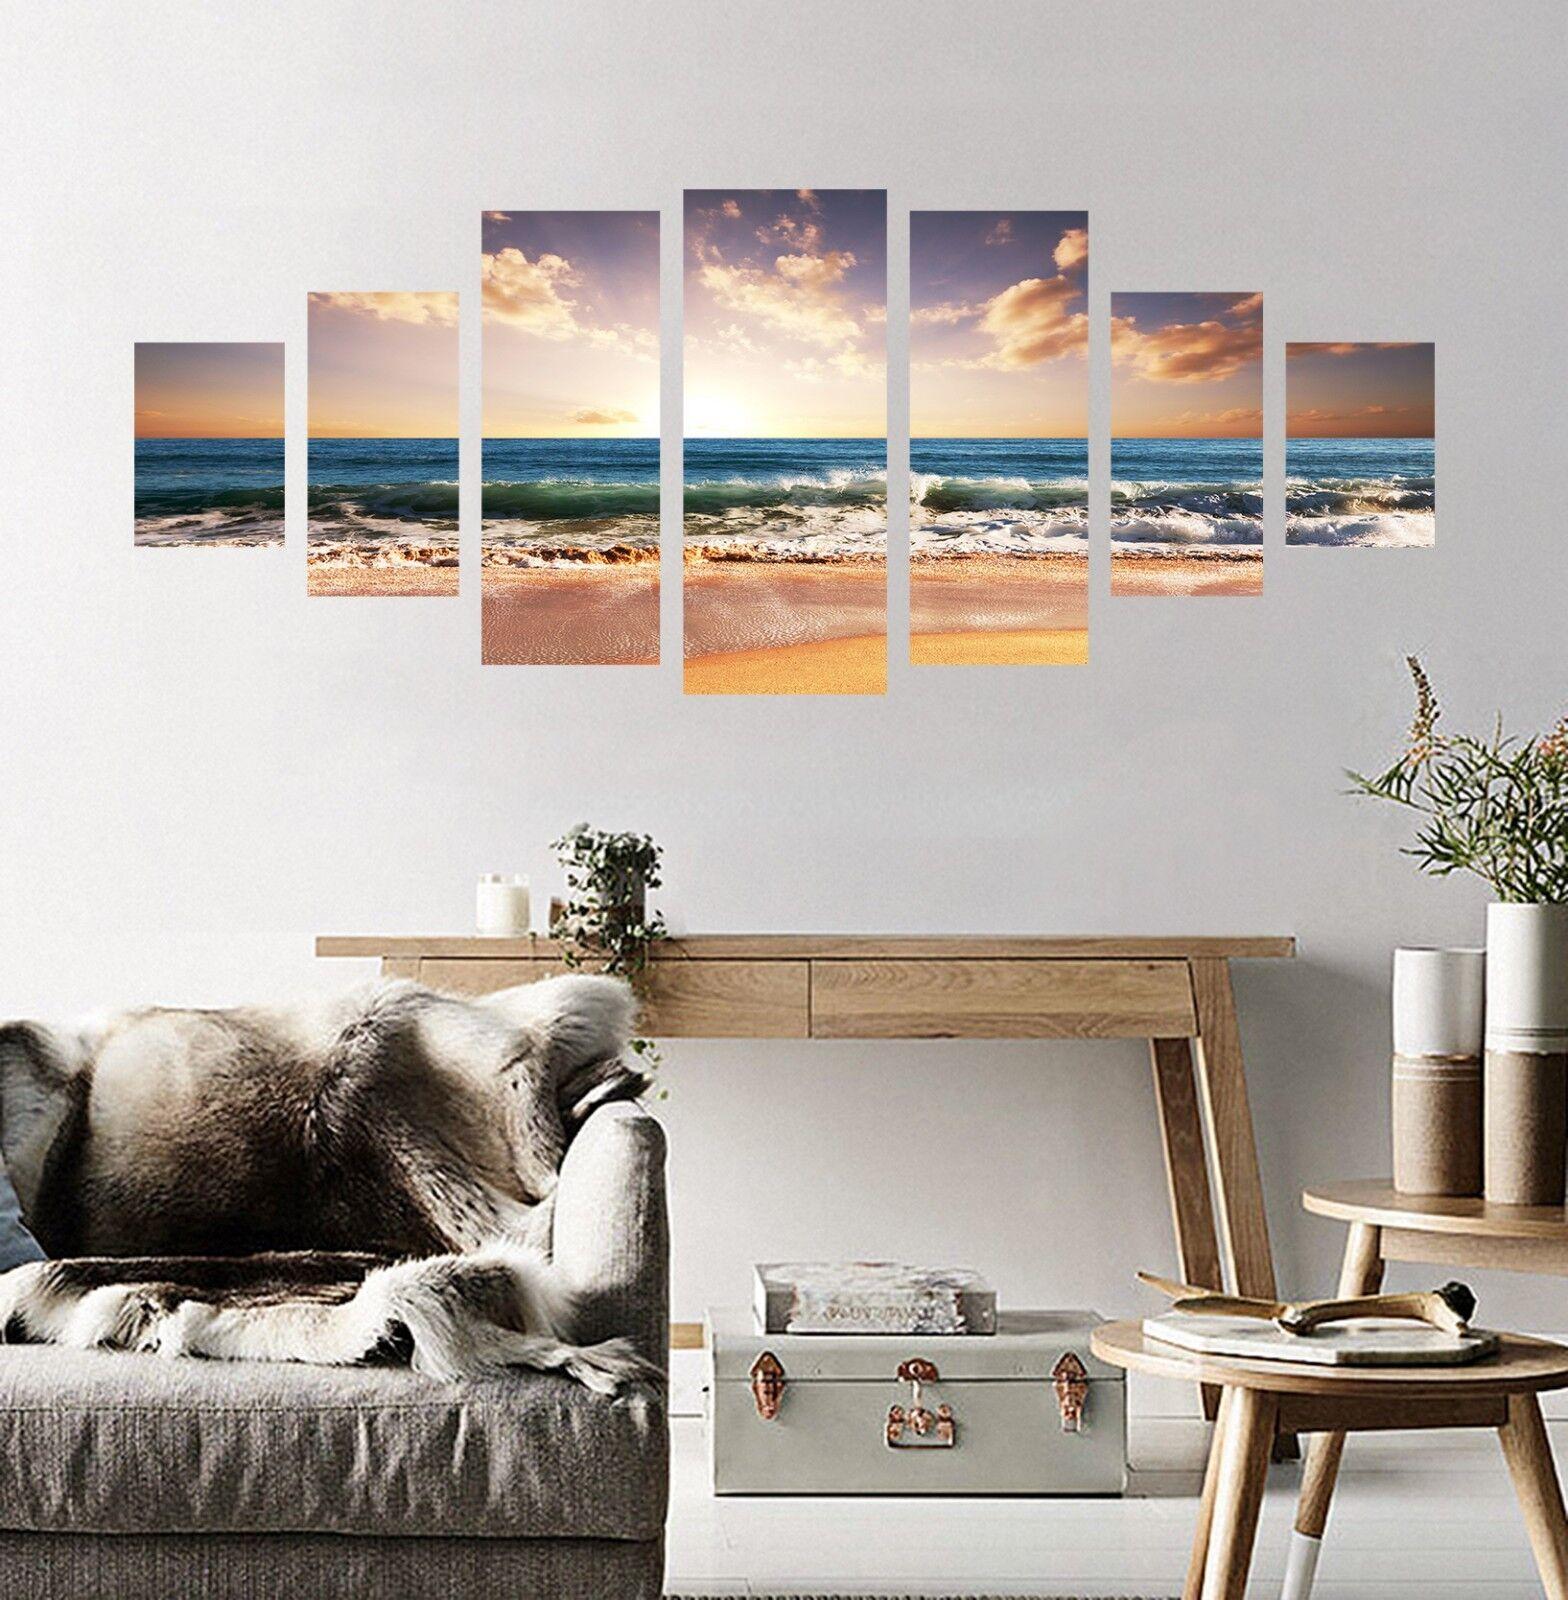 cheap designer brands 3D Sunlight Beach Sea Sea Sea 6